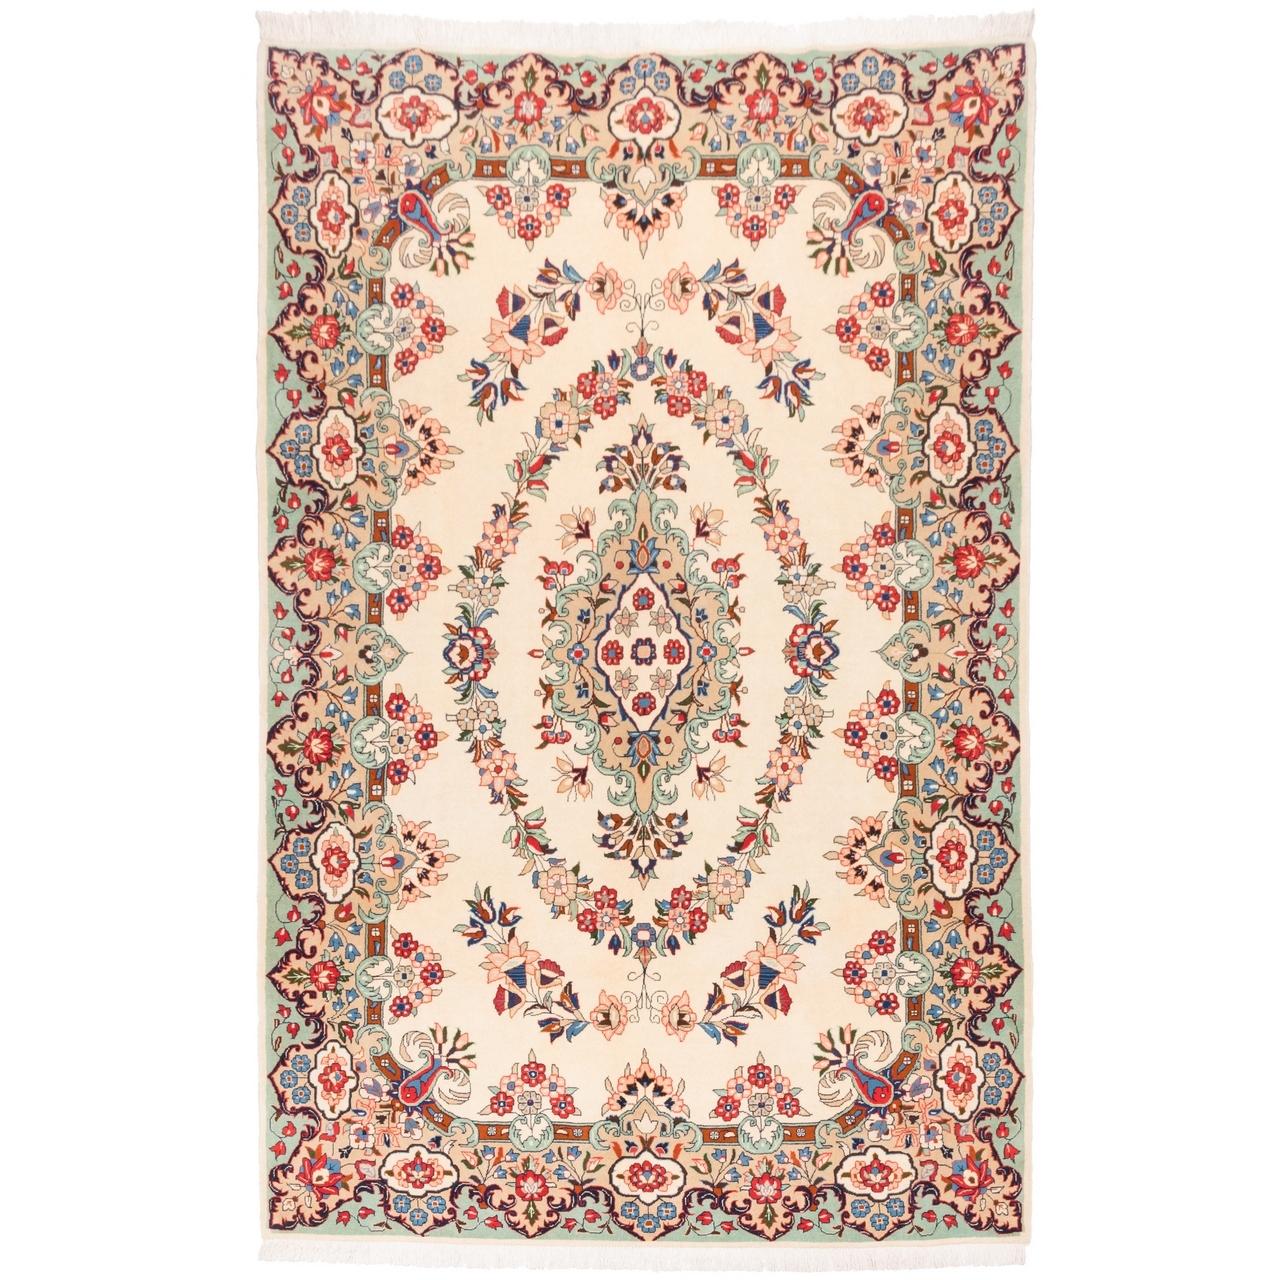 فرش دستباف شش متری سی پرشیا کد 174183